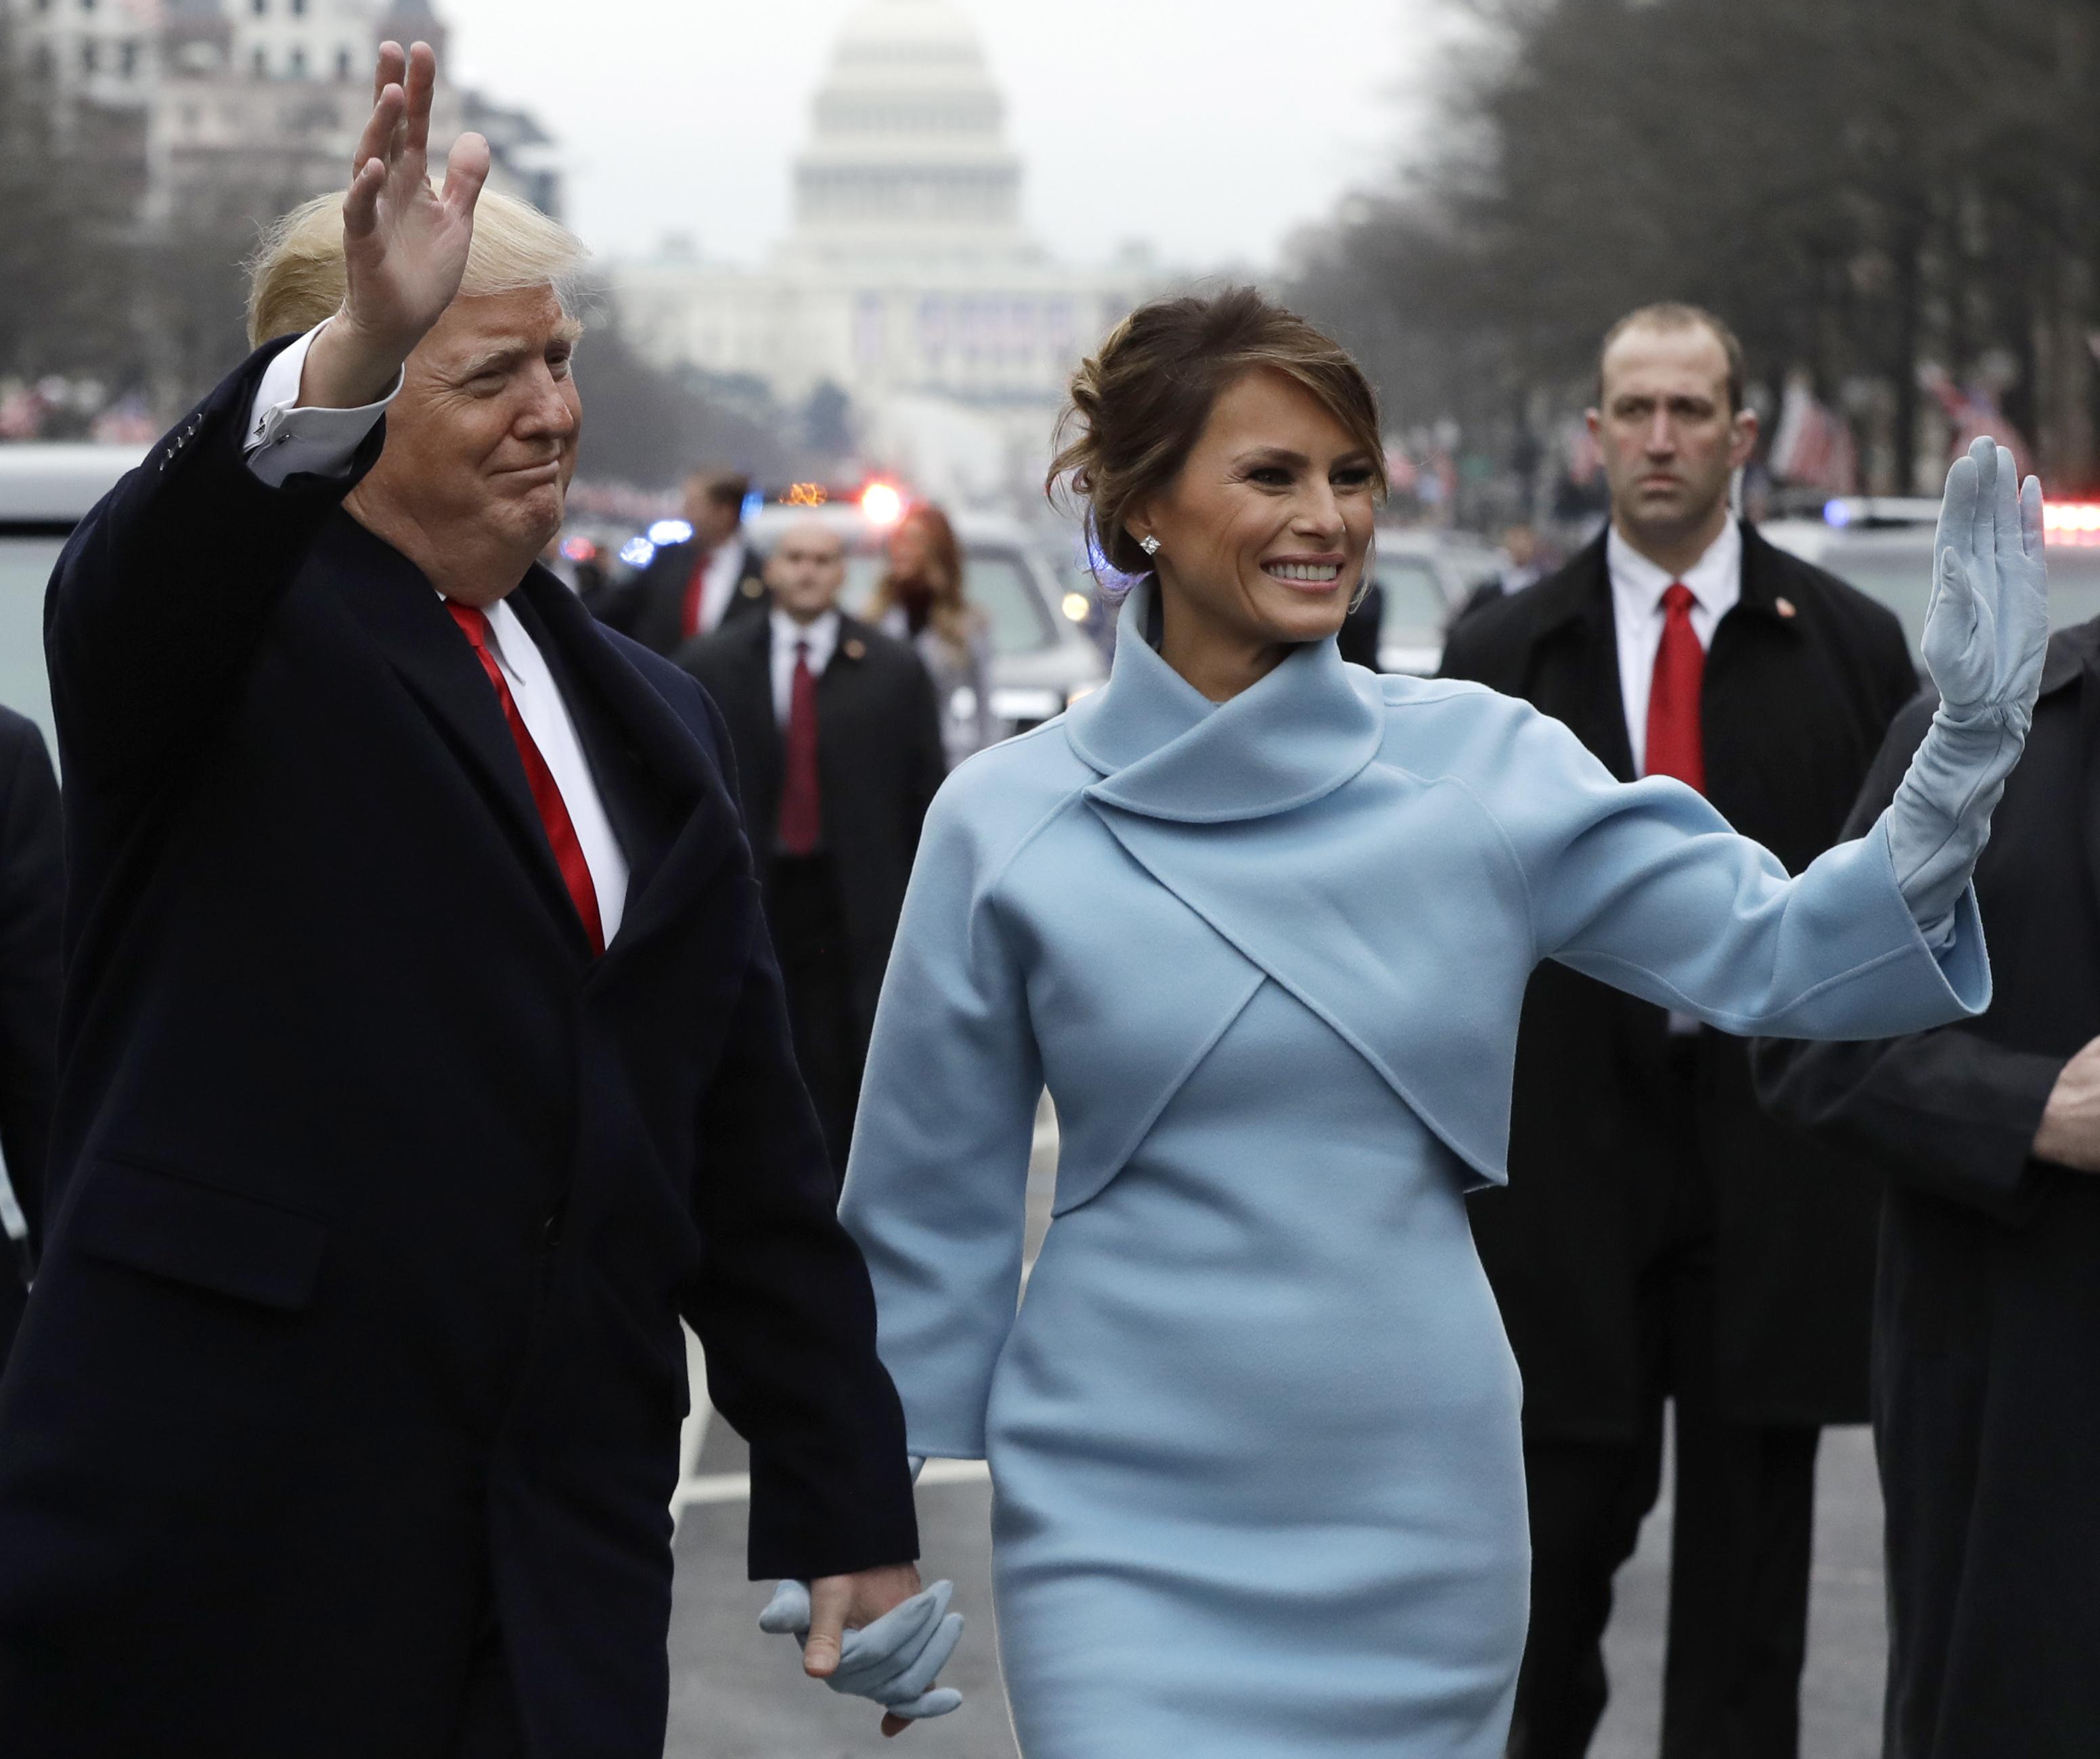 Parade Celebrates Presidential Inauguration Of Donald Trump